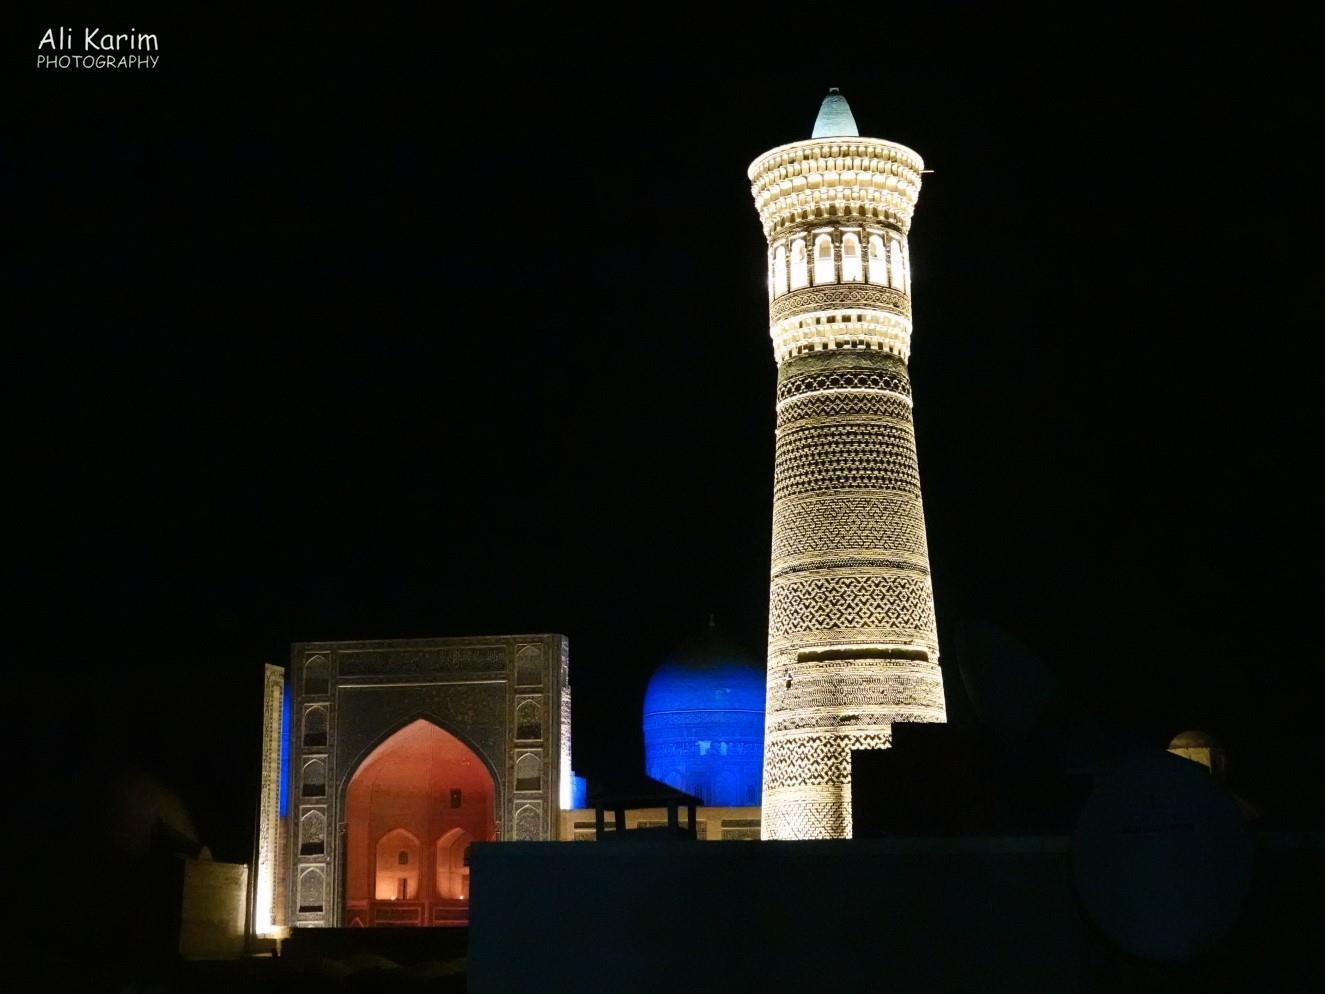 Bukhara, Oct 2019, Kalyan minaret and the Mir Arab Madrassah behind it